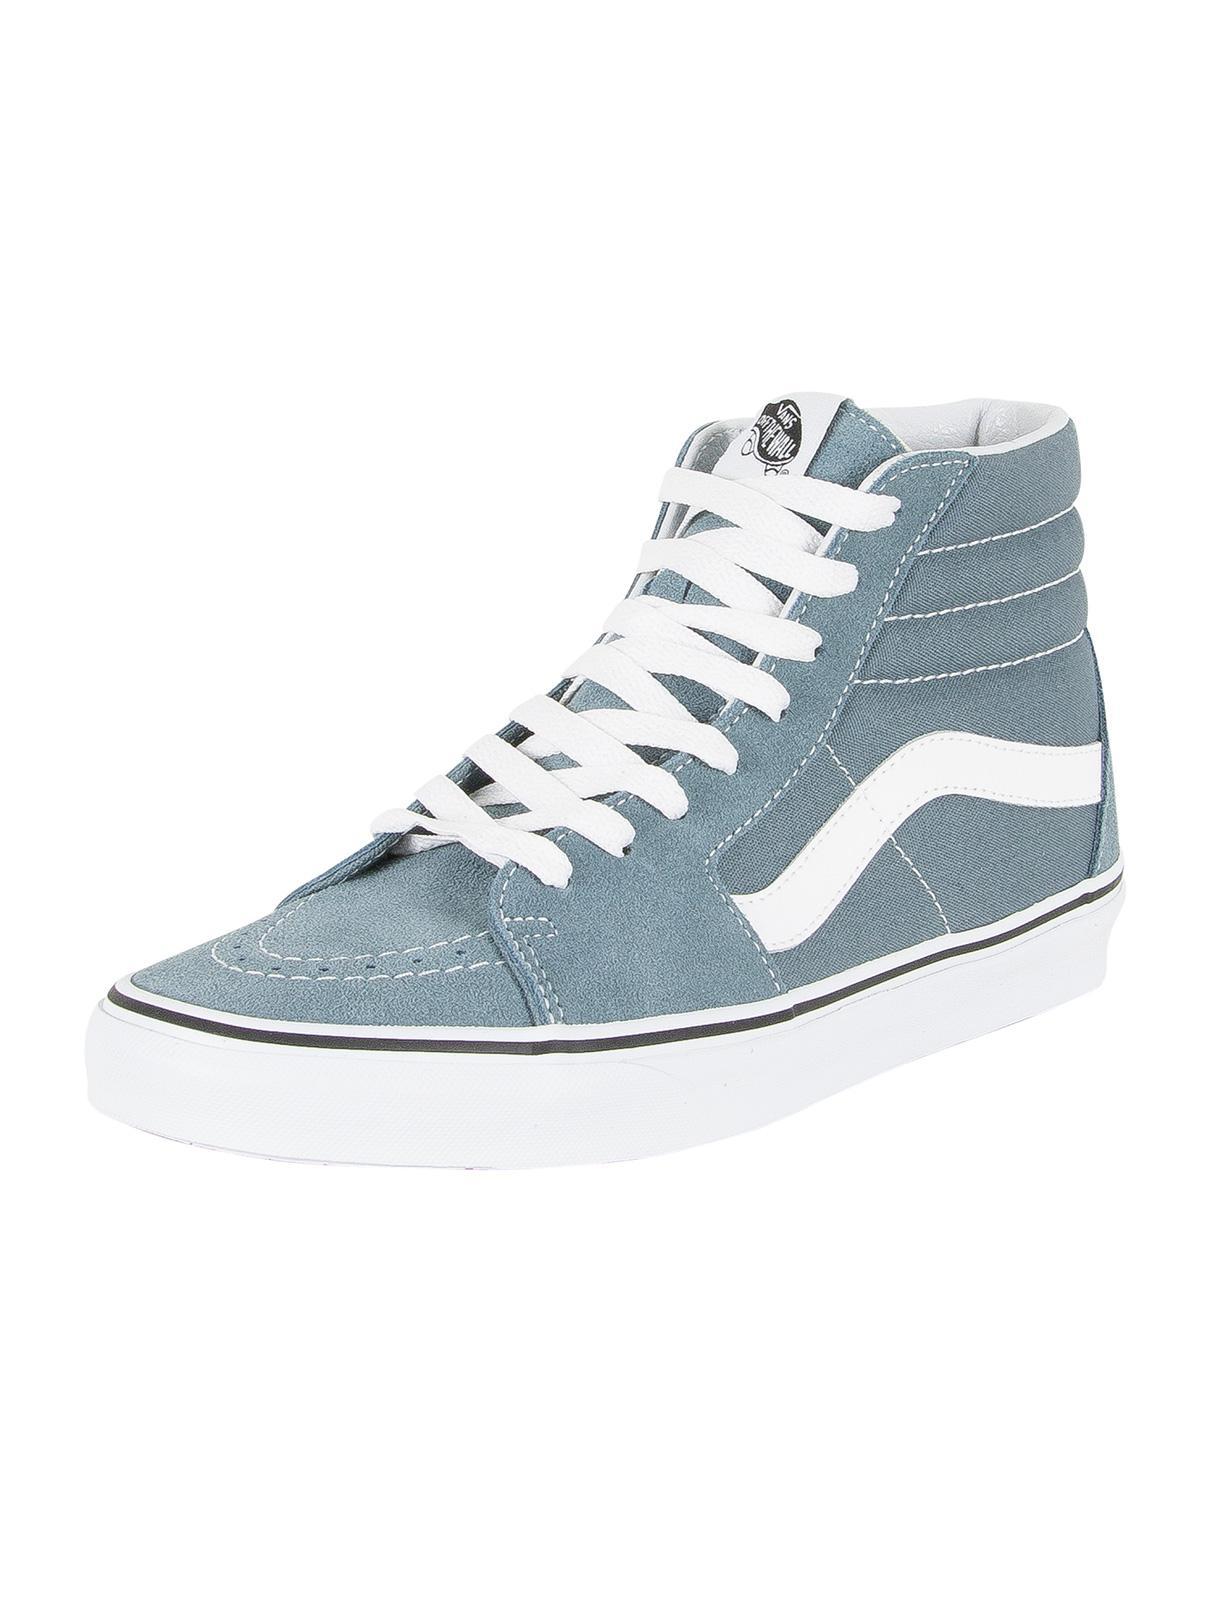 72d4074a55 Lyst - Vans Goblin Blue true White Sk8-hi Trainers in Blue for Men